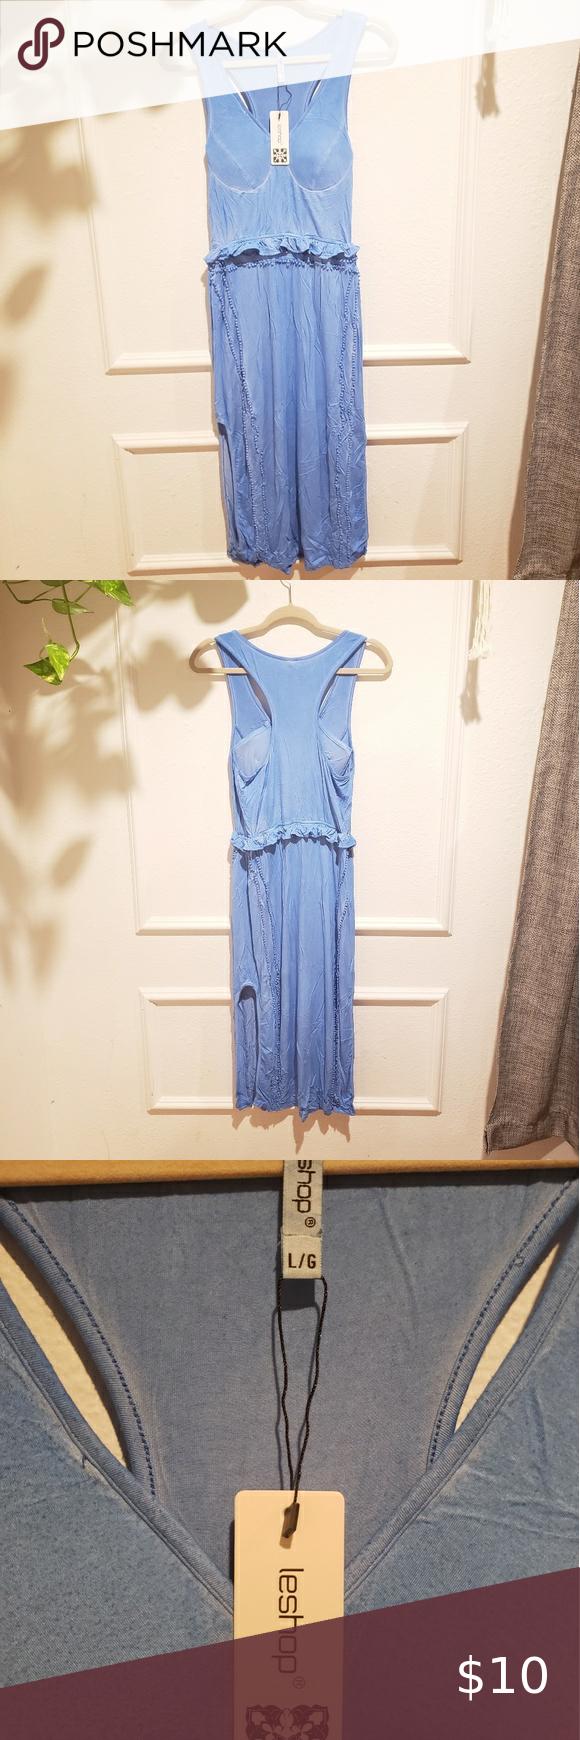 Leshop Dress New With Tags Very Light Stretchy Summer Dress Leshop Dresses Vintage Shirt Dress Dress Size Chart Women Coral Maxi Dresses [ 1740 x 580 Pixel ]